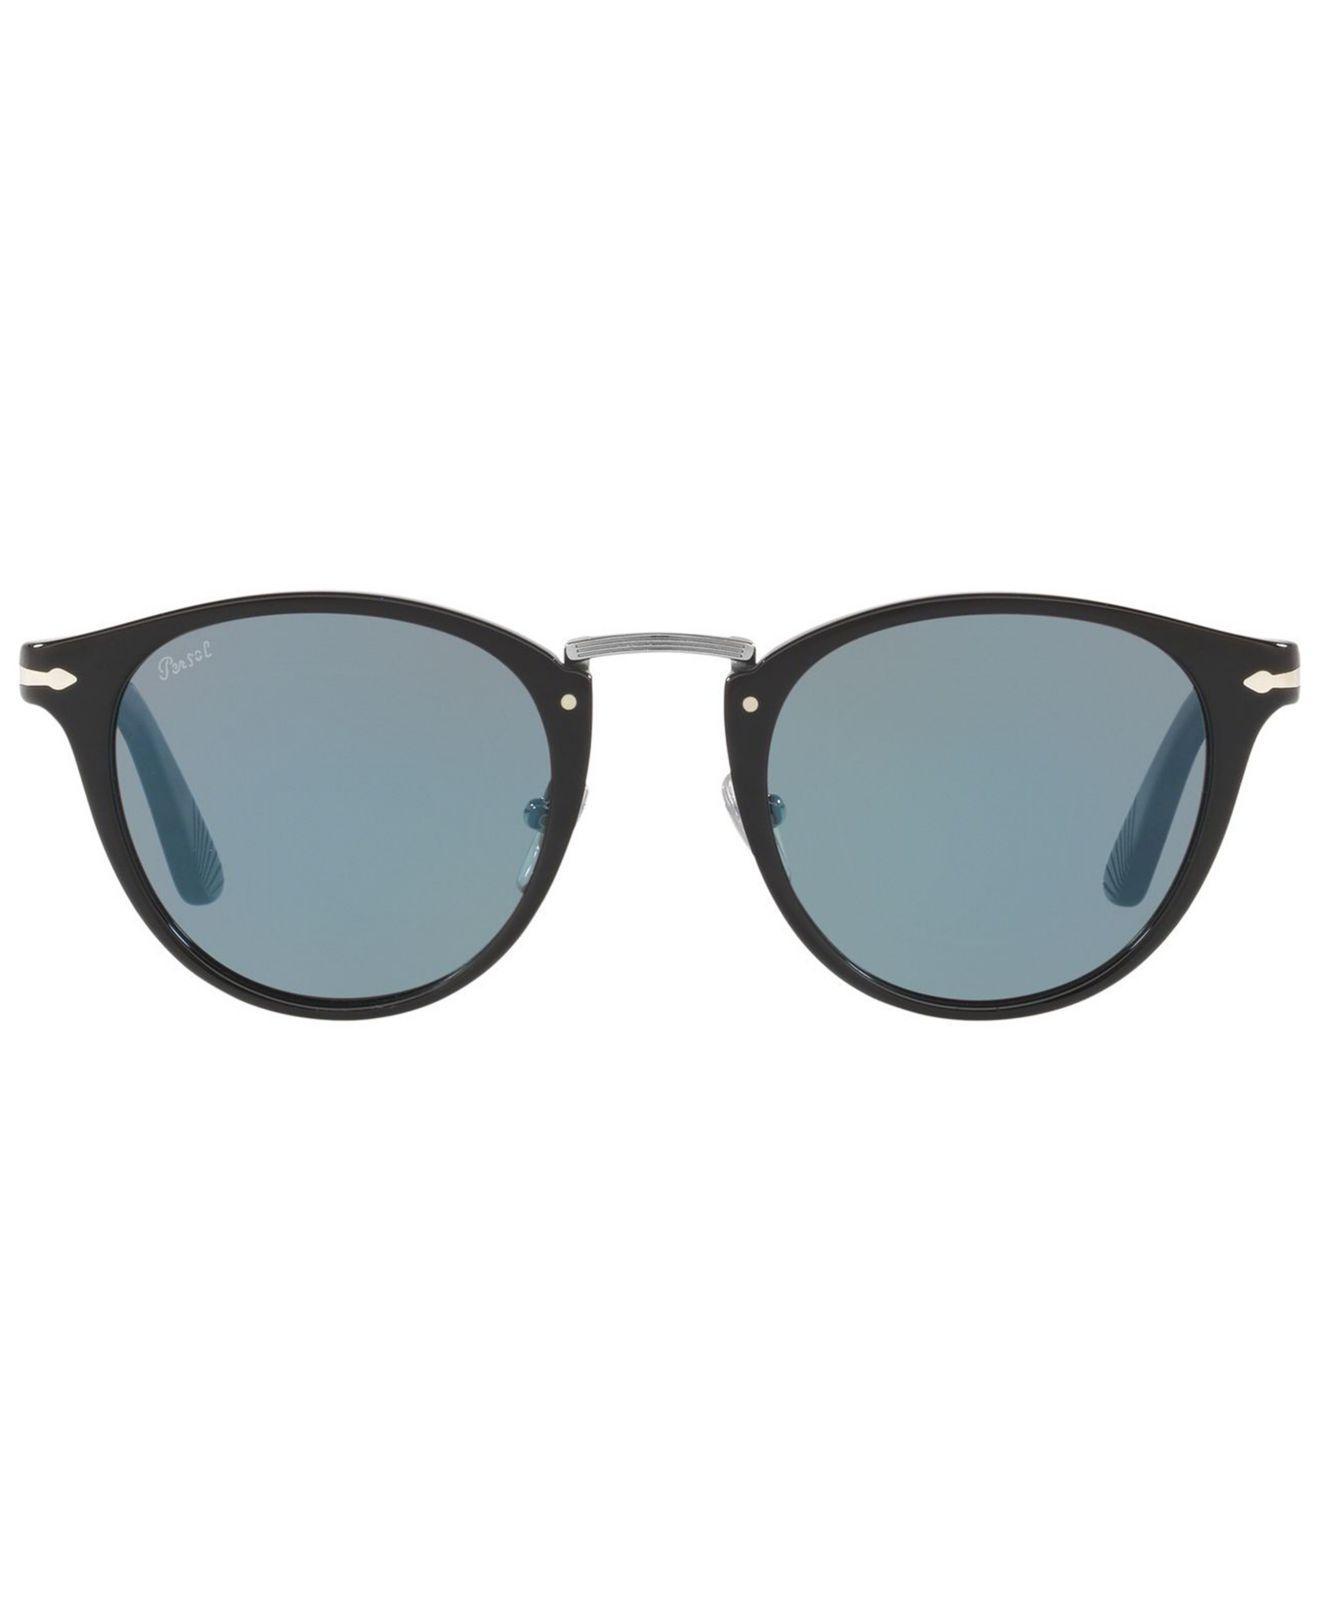 79070d7ef6042 Lyst - Persol Sunglasses